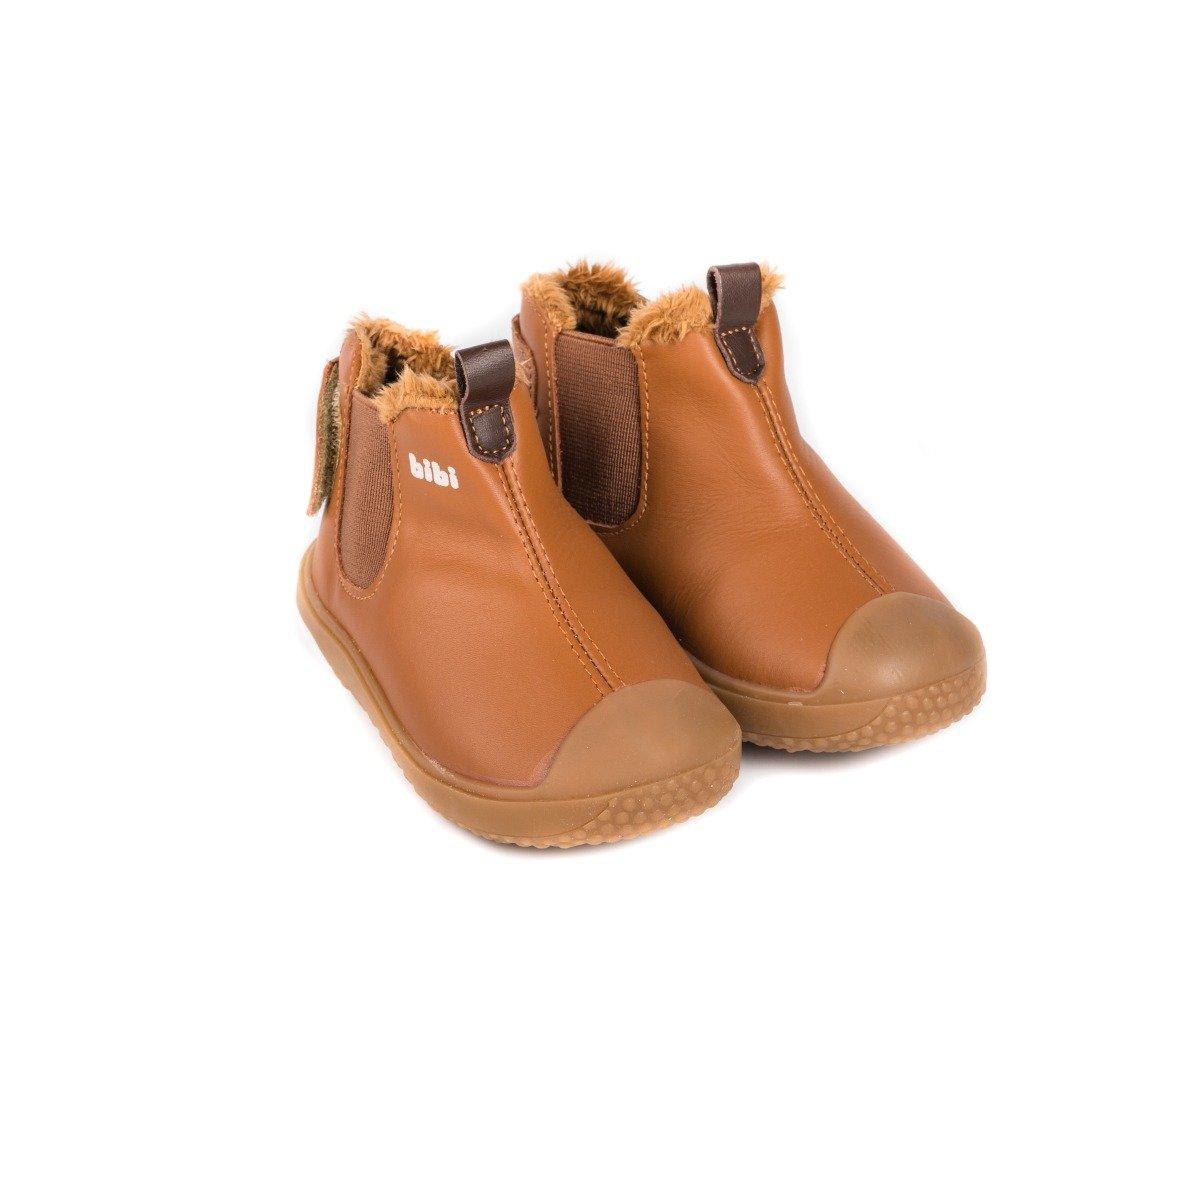 Ghete cu blanita Bibi Shoes Prewalker Caramel imagine